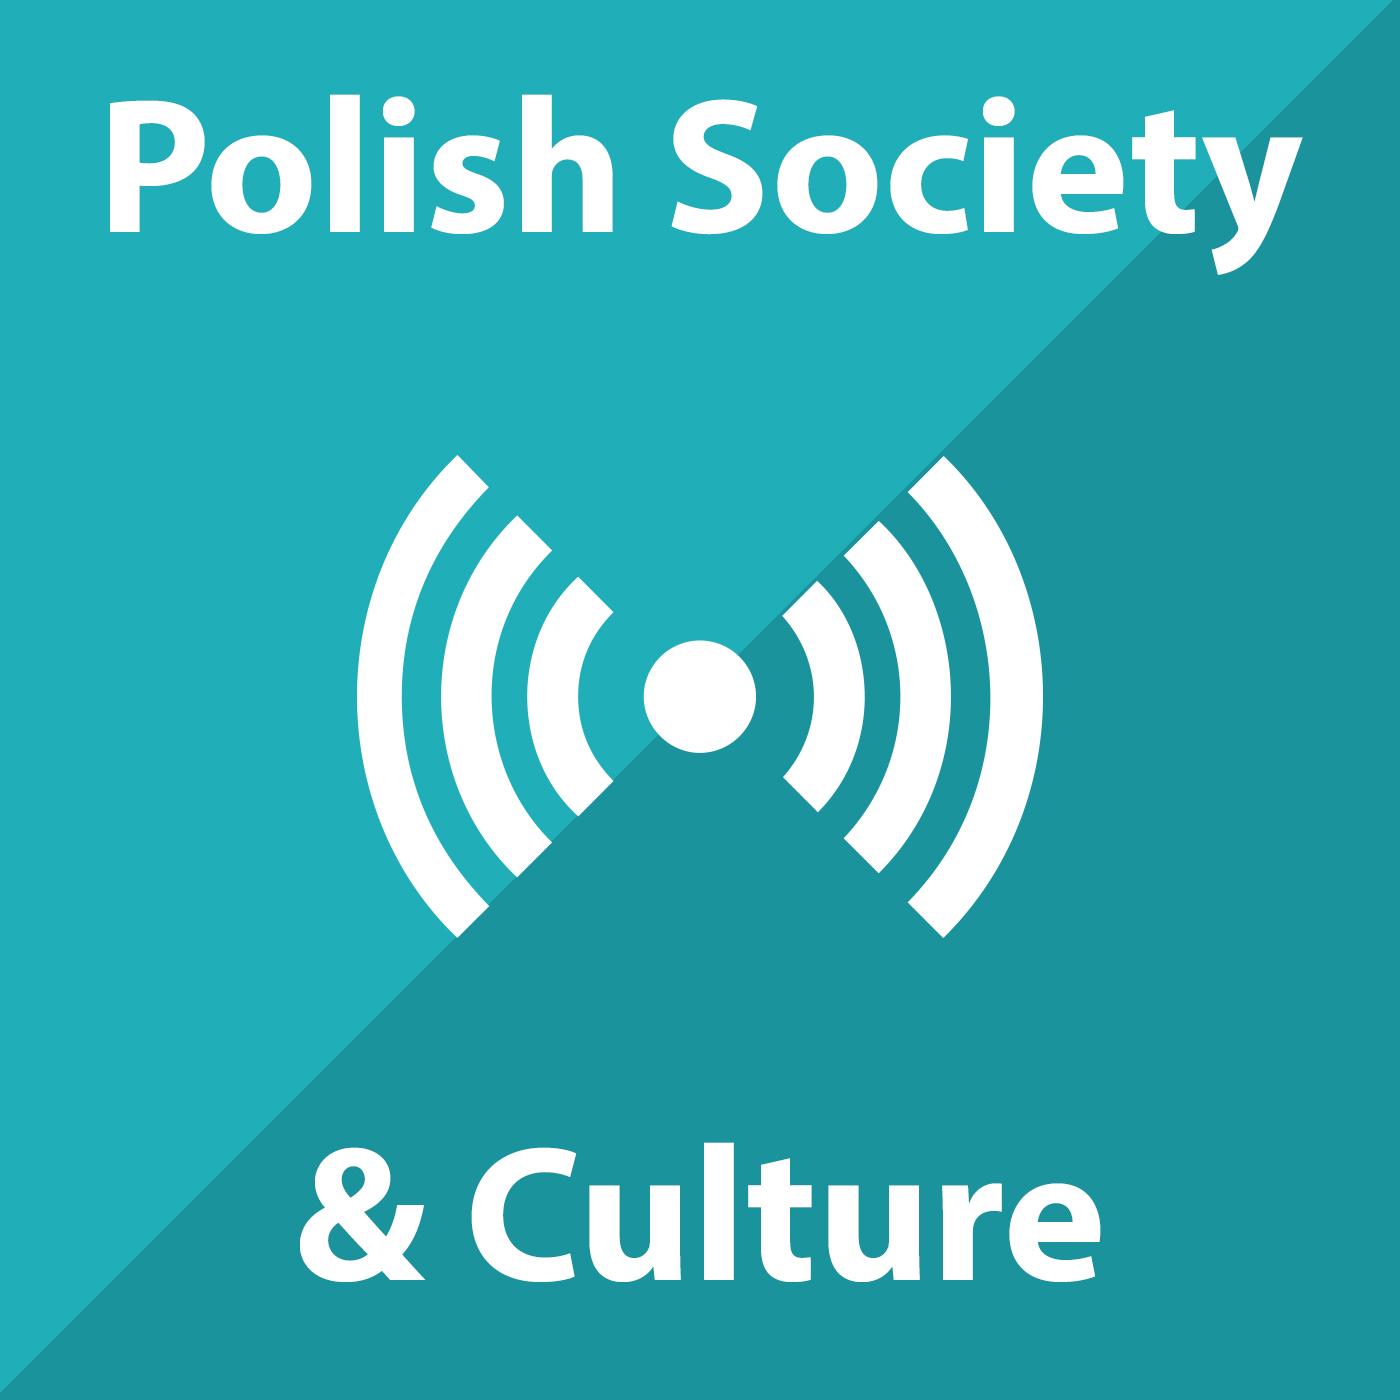 Polish Society & Culture